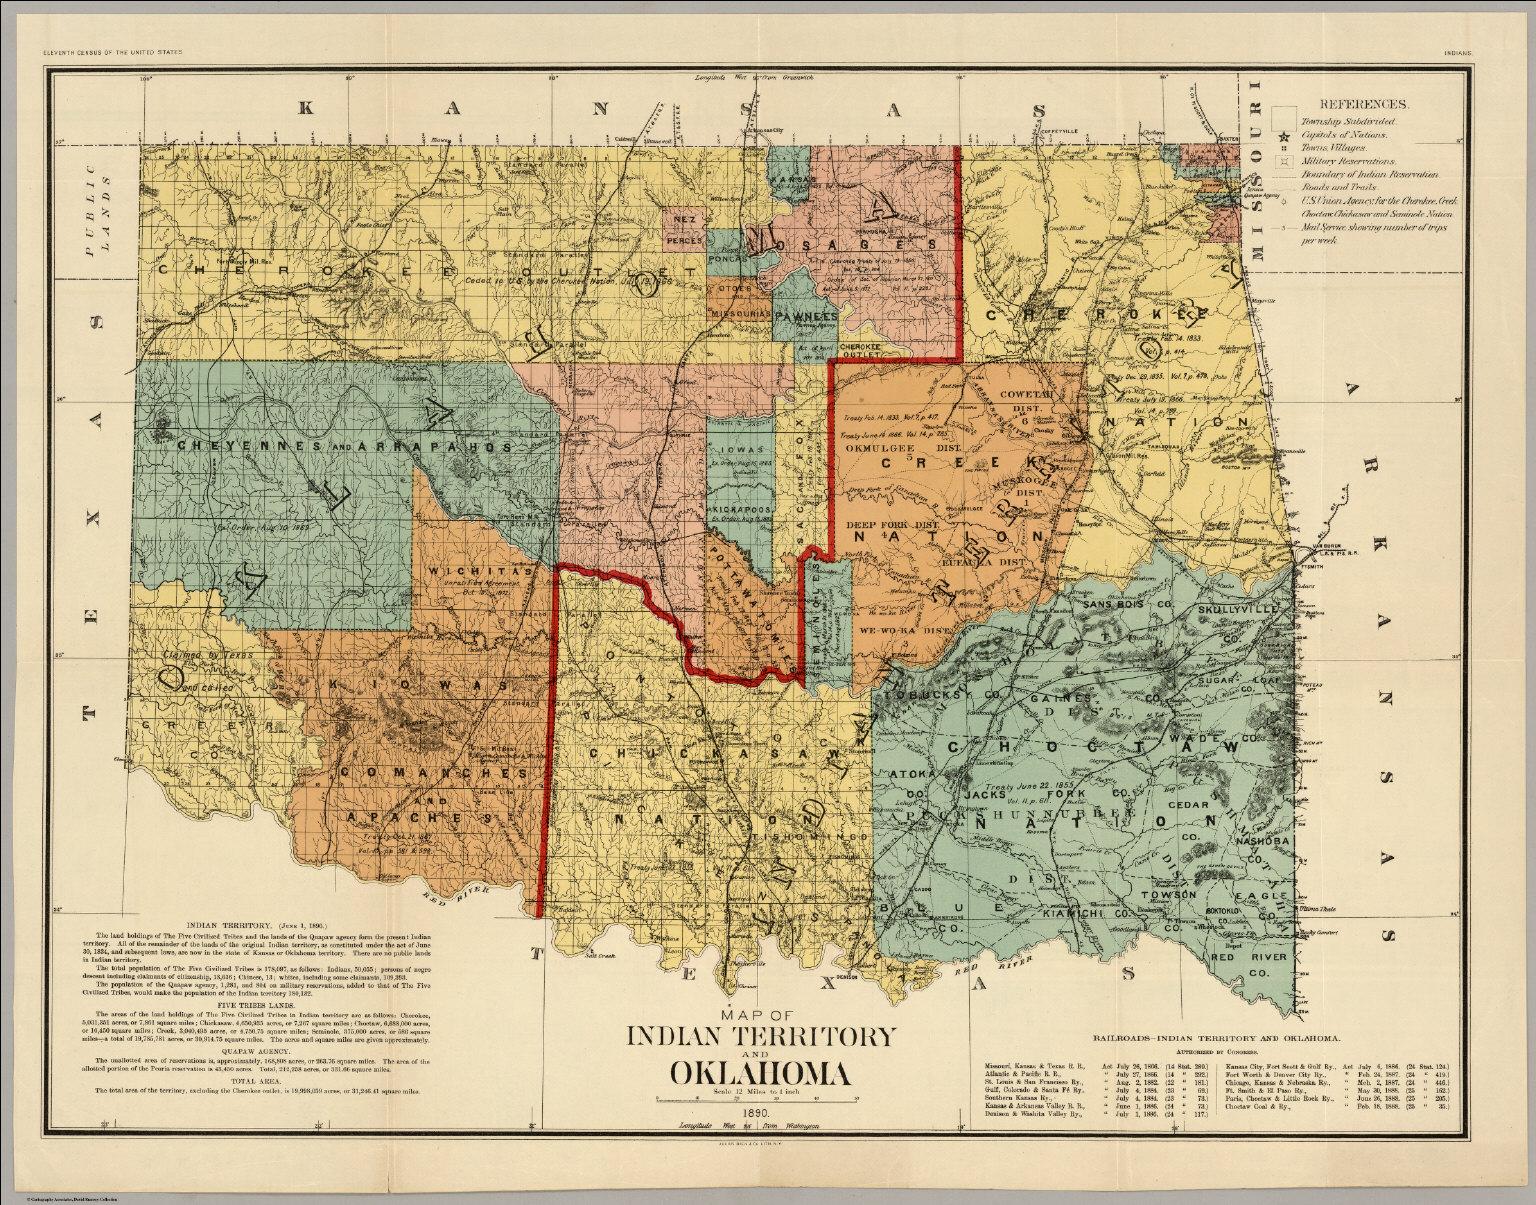 oklahoma indian territory1890 13